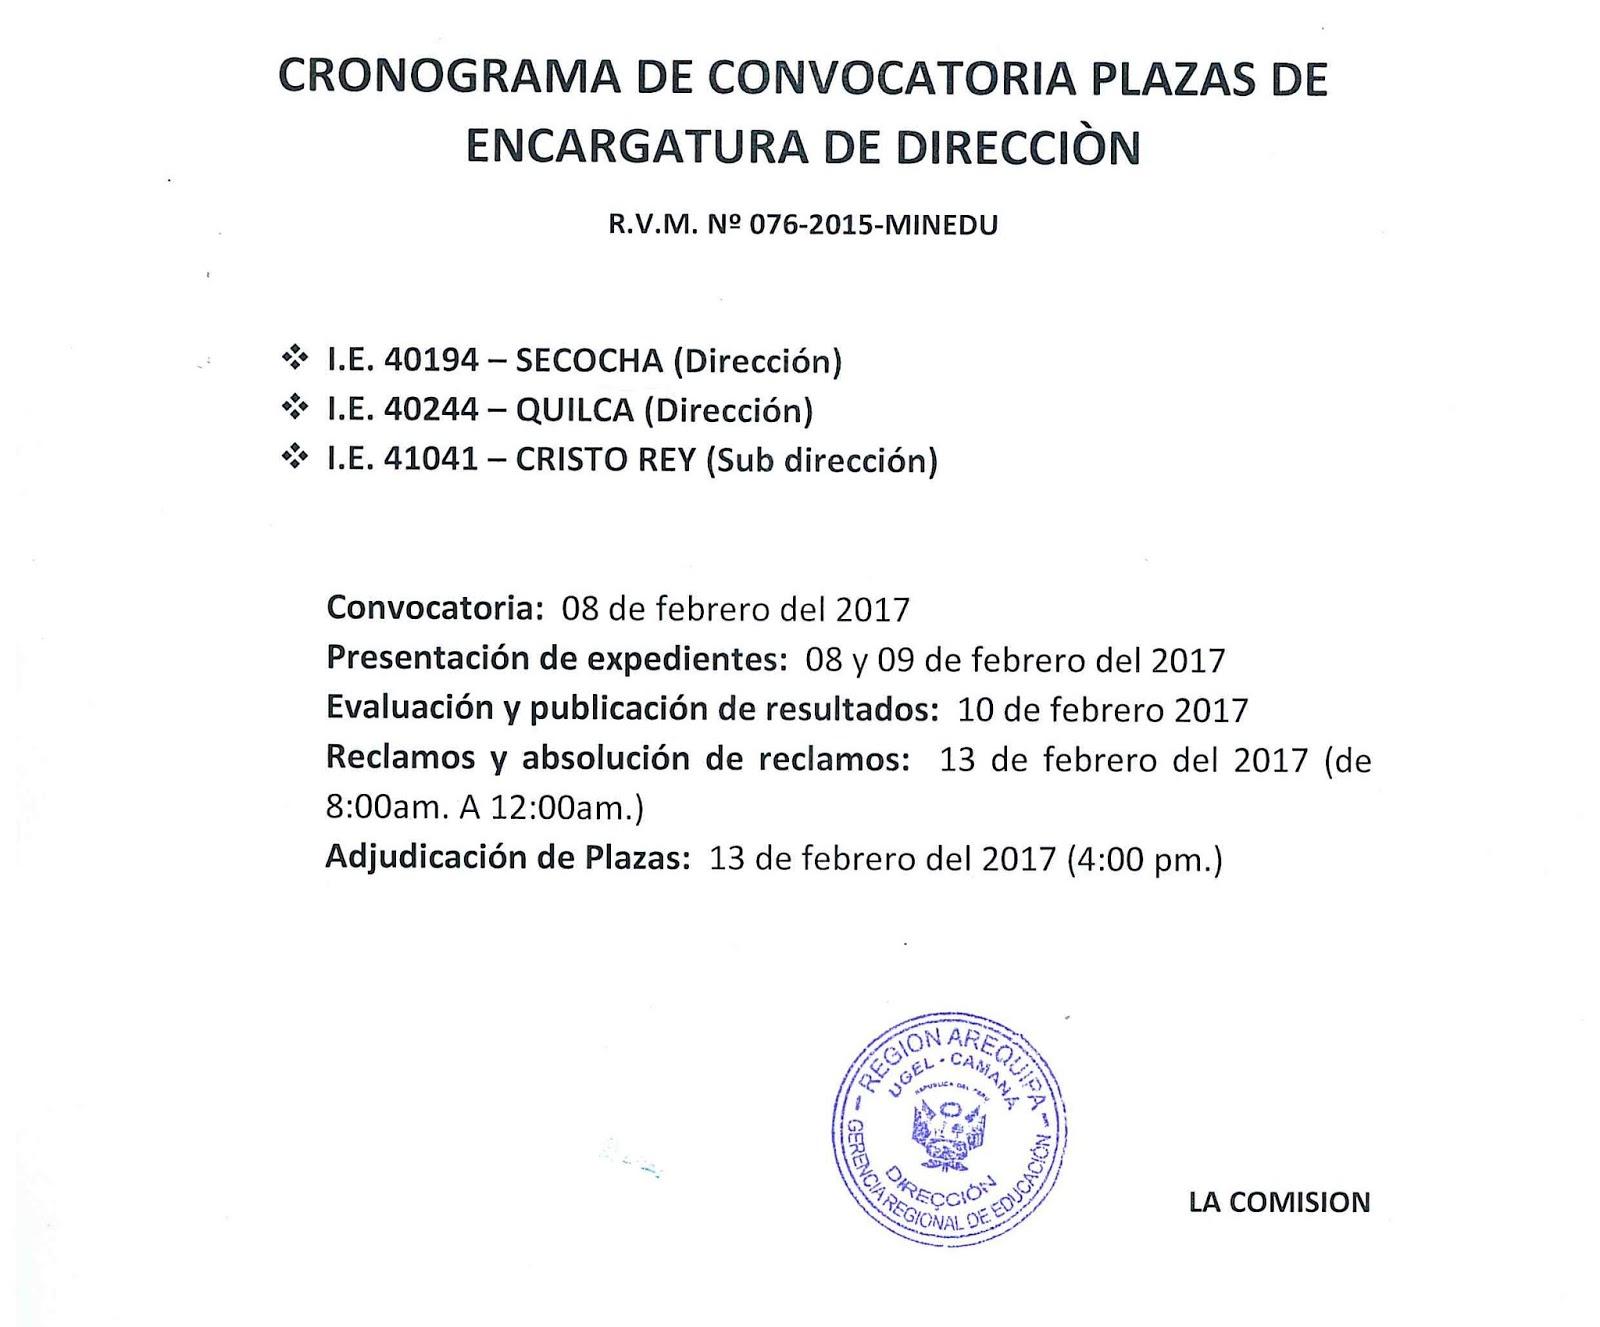 Cronograma de encargatura de direcci n ugel caman for Convocatoria de plazas docentes 2017